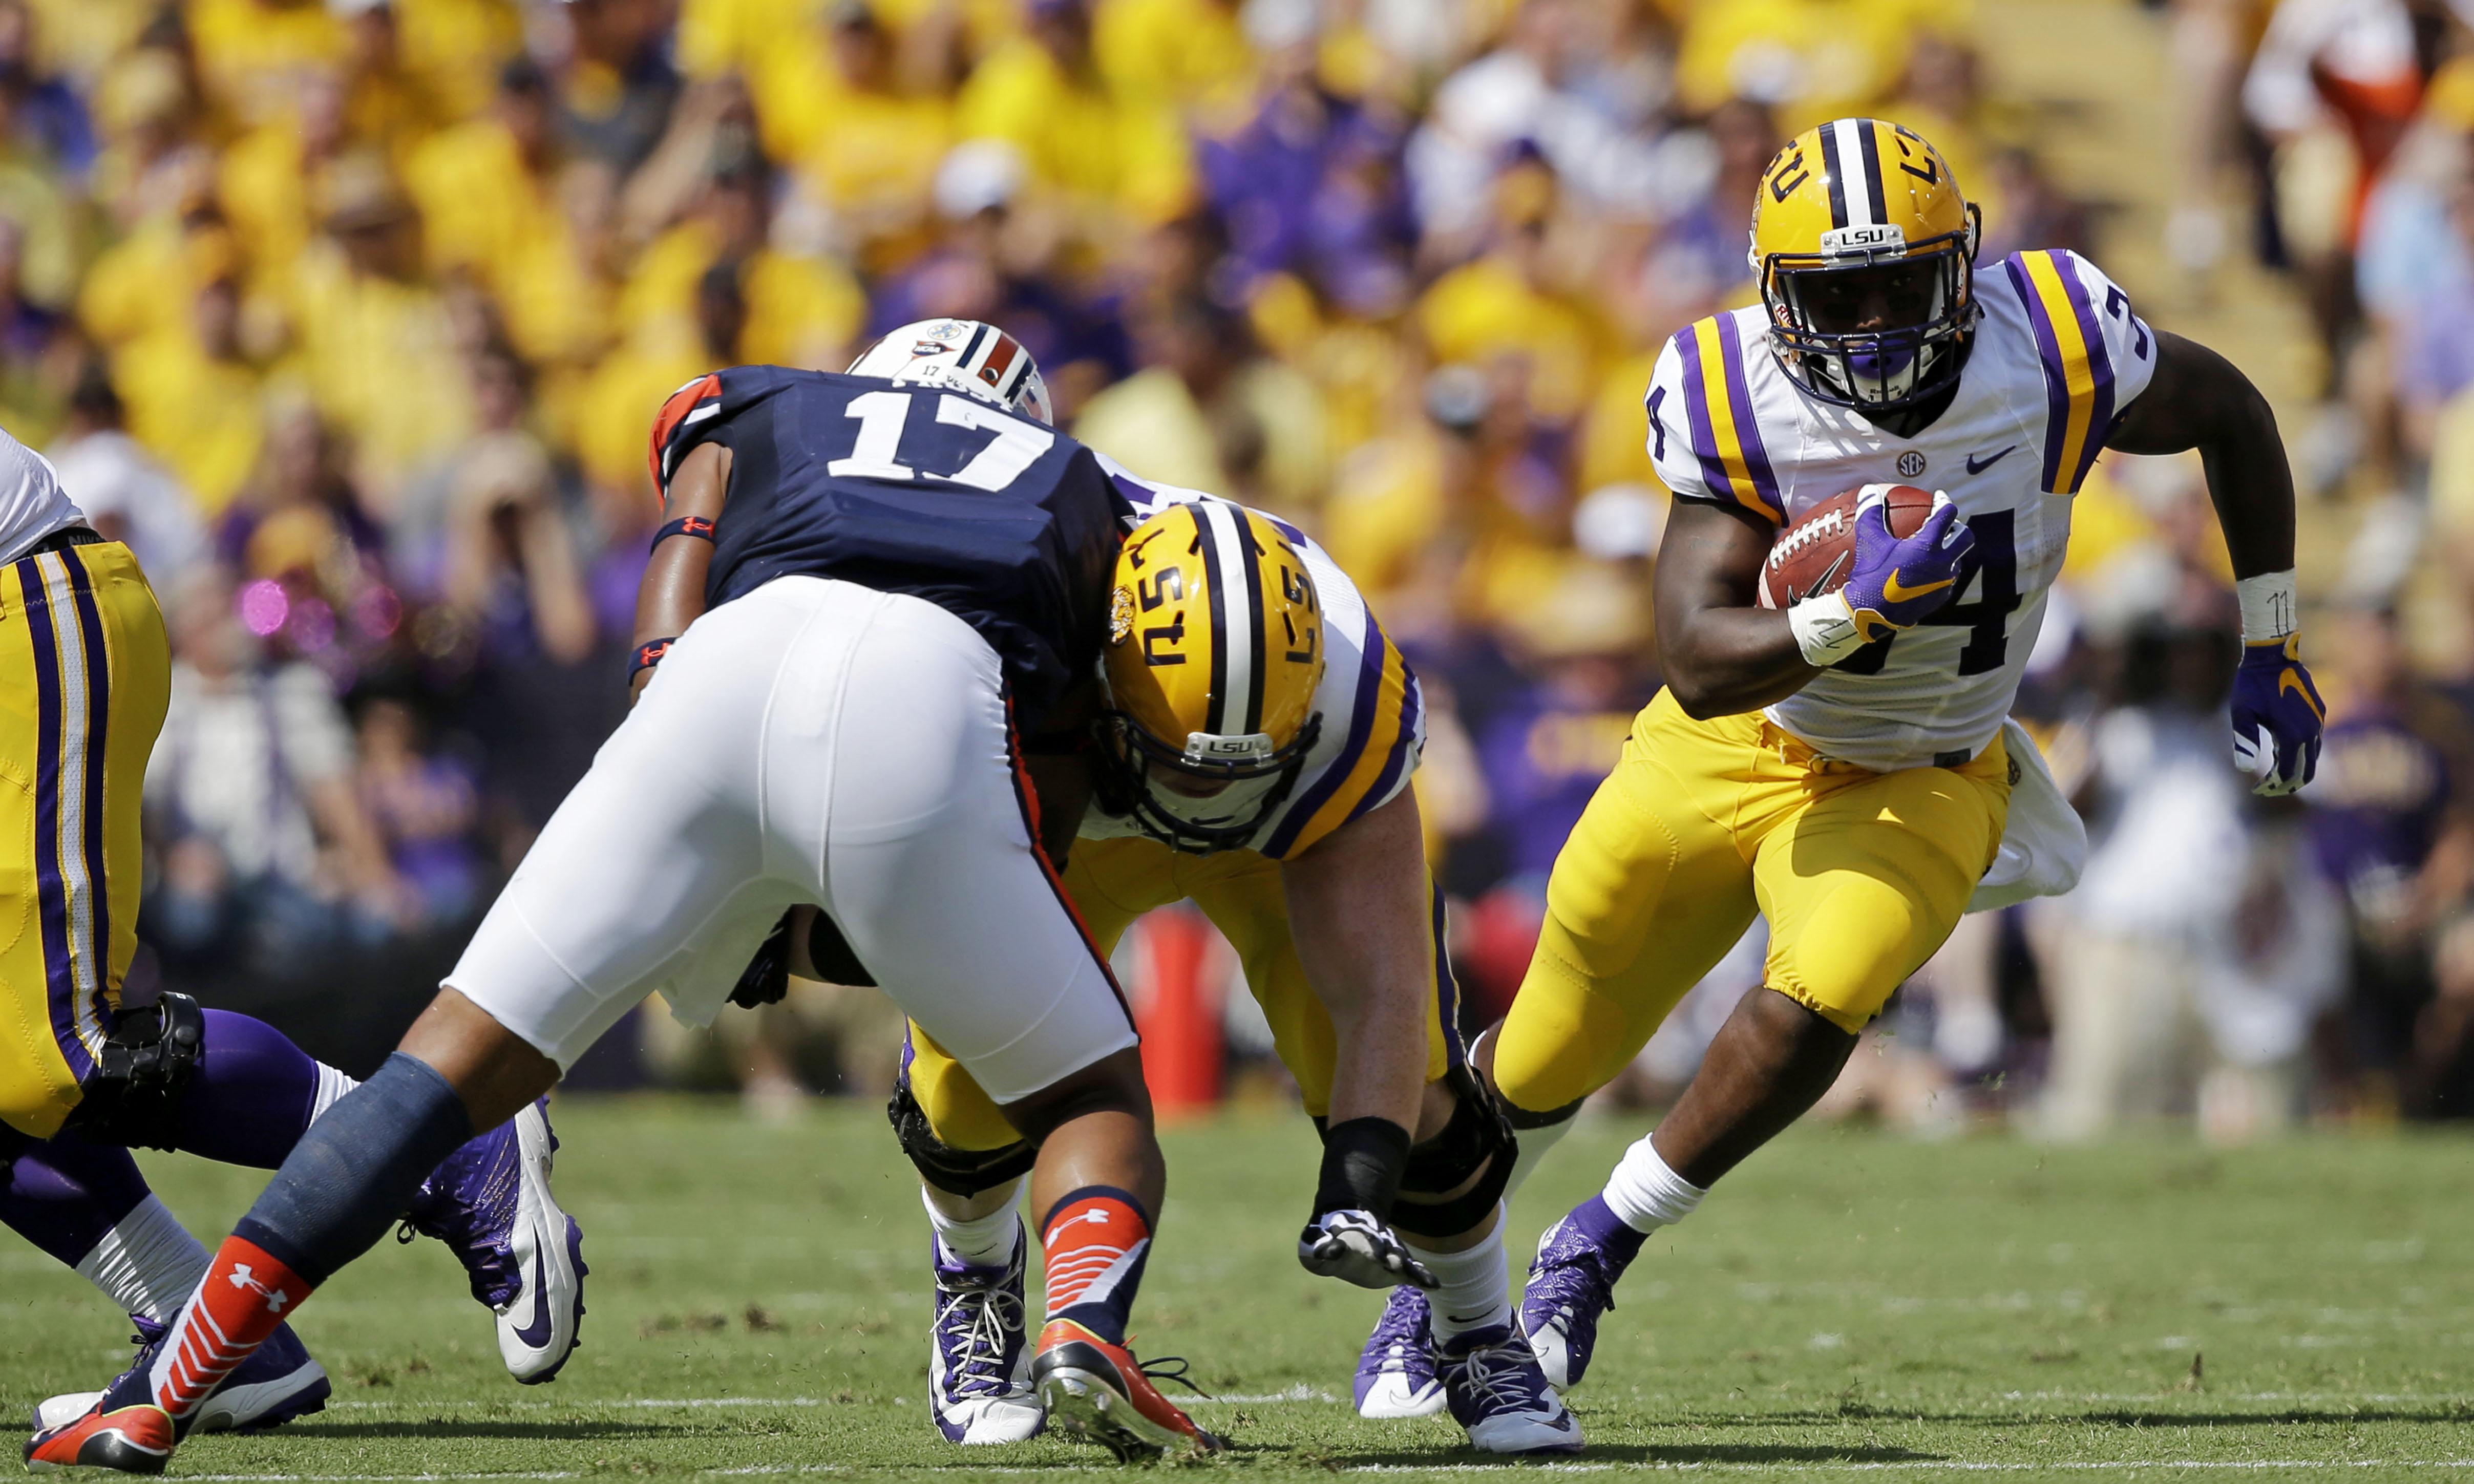 LSU running back Darrel Williams (34) carries past Auburn linebacker Kris Frost (17) in the first half of an NCAA college football game in Baton Rouge, La., Saturday, Sept. 19, 2015. (AP Photo/Gerald Herbert)